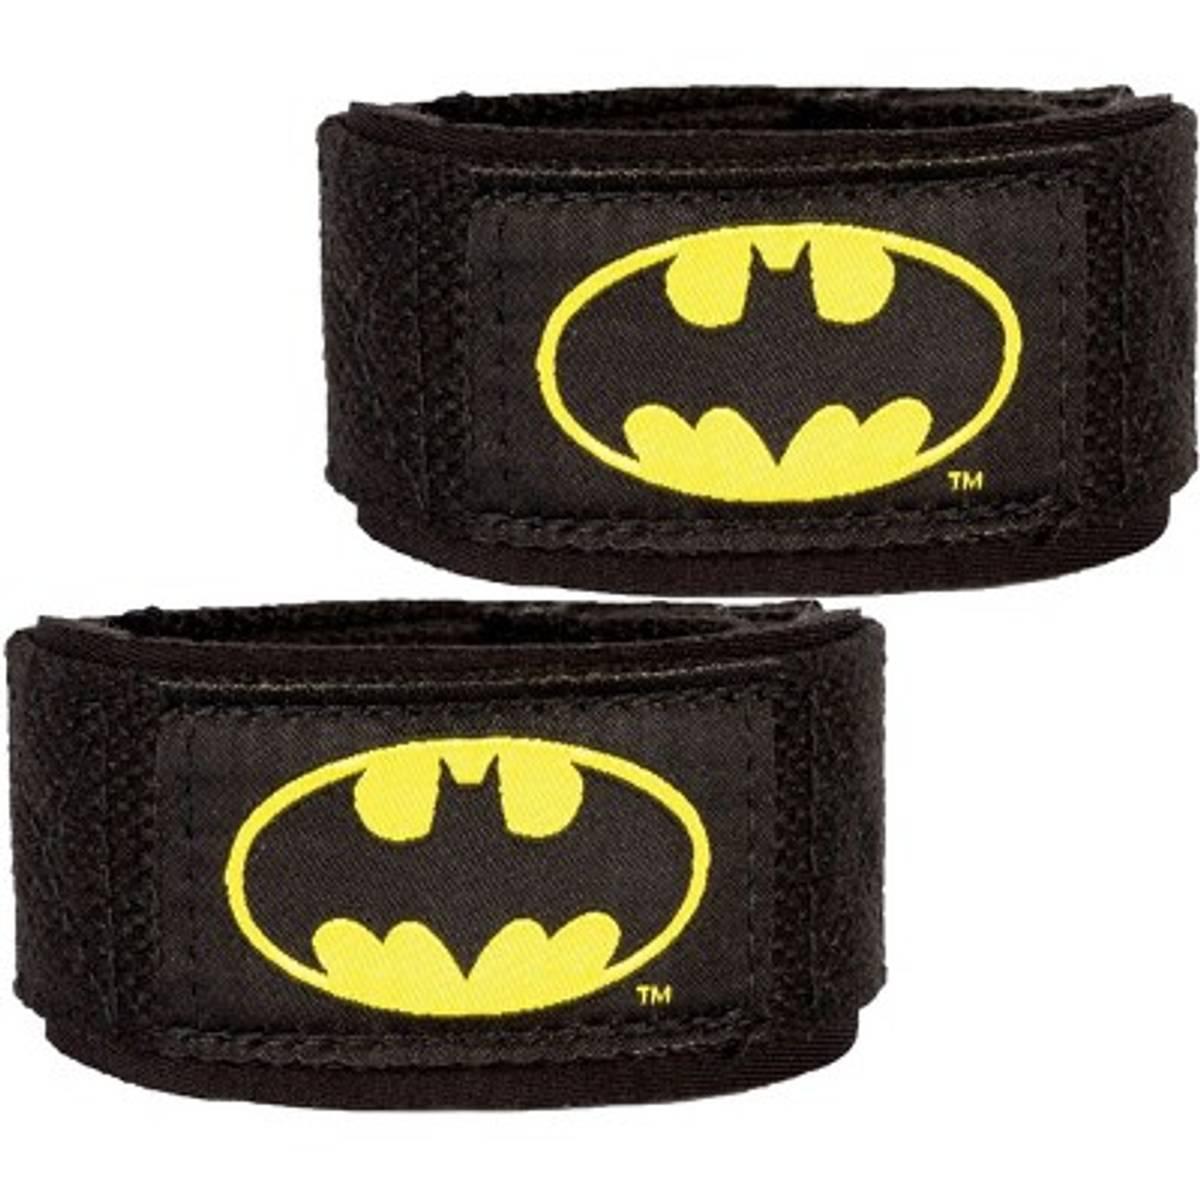 Performa - Lifting Straps Batman